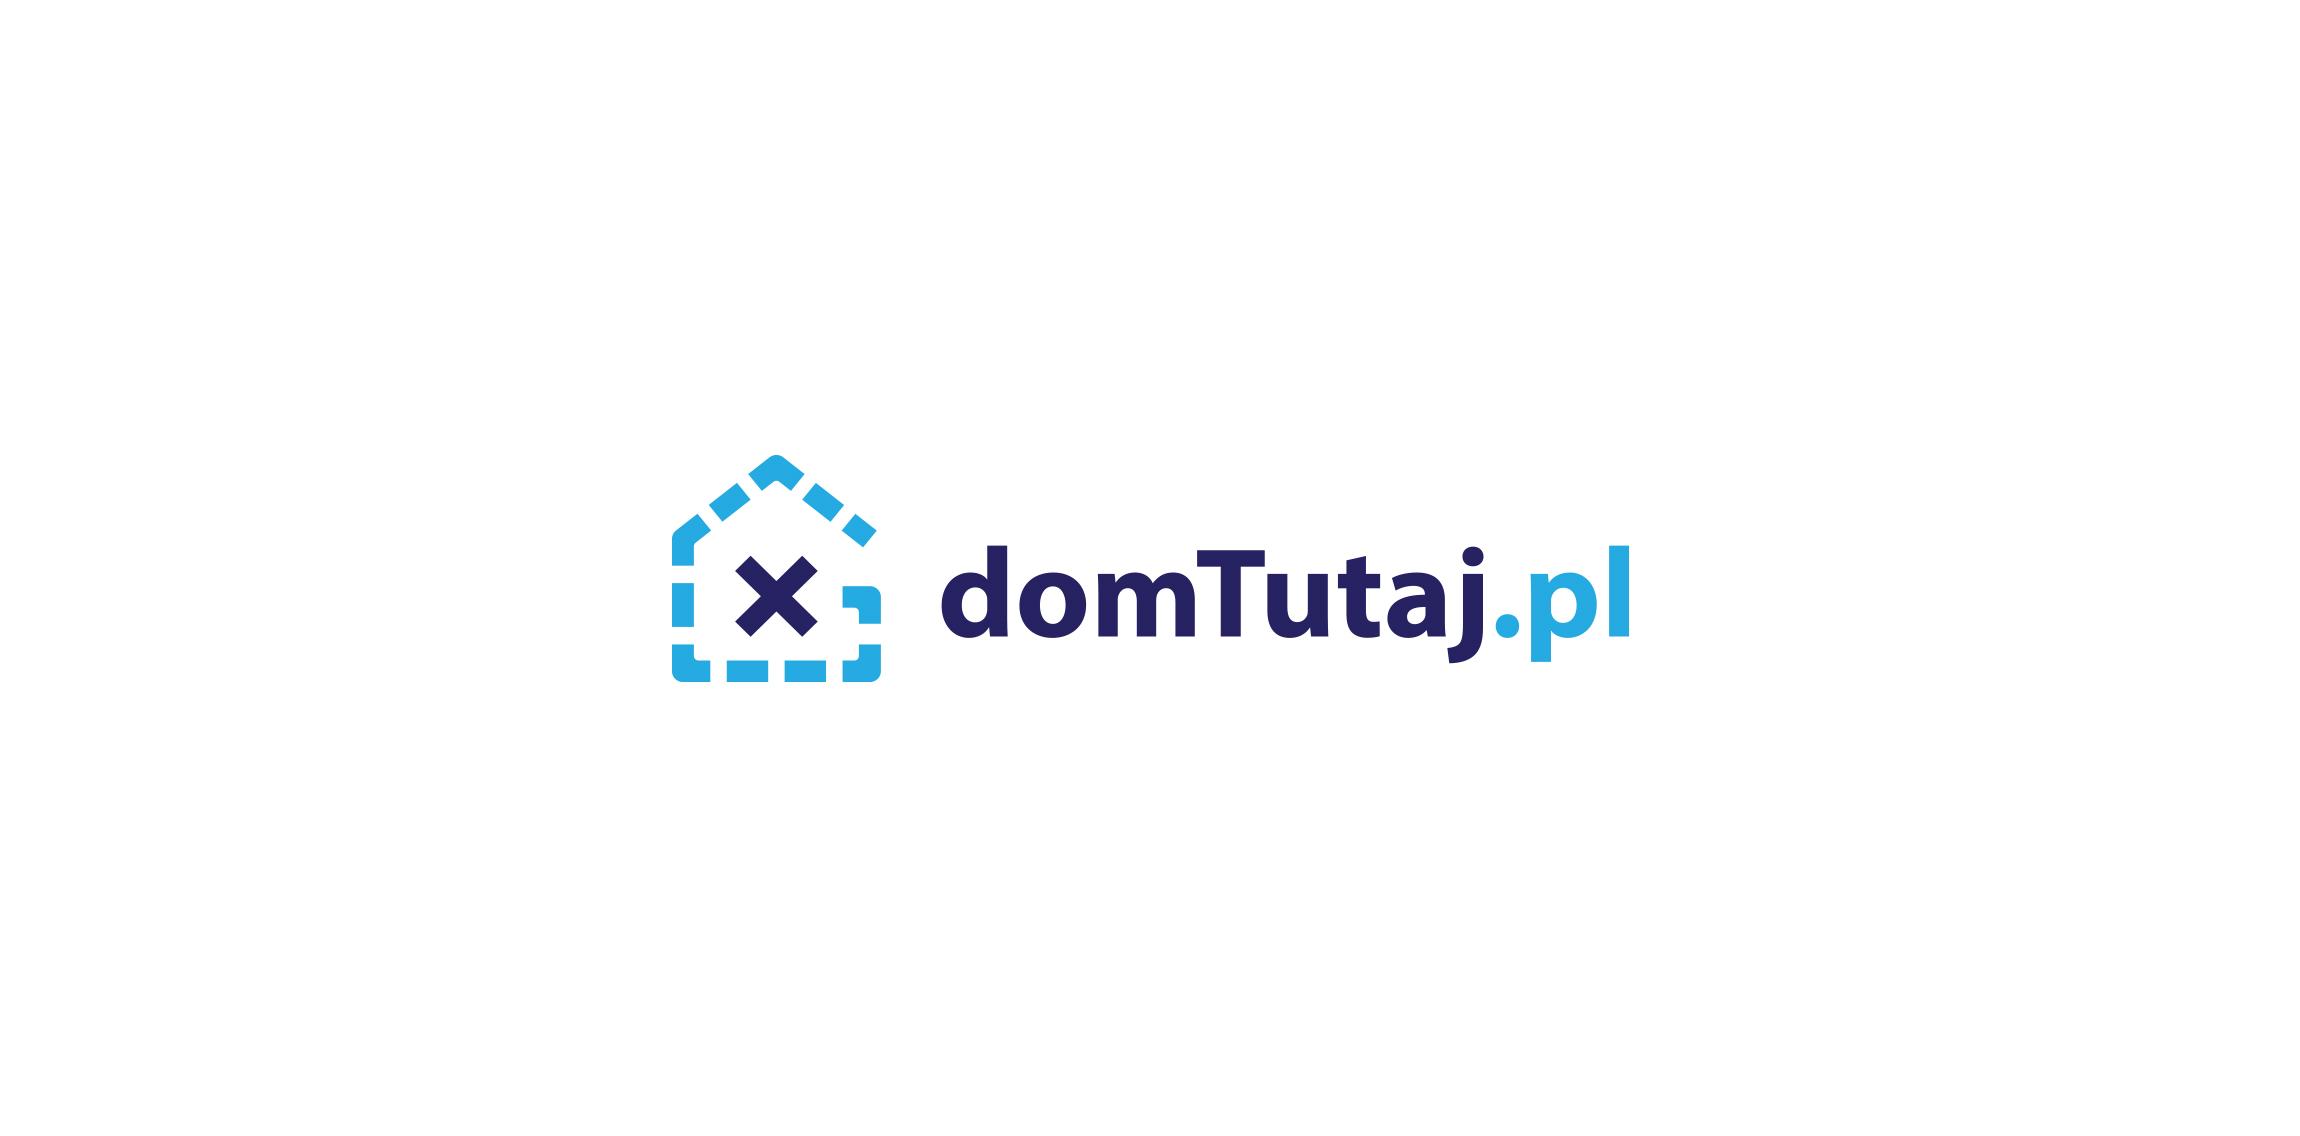 DomTutaj.pl